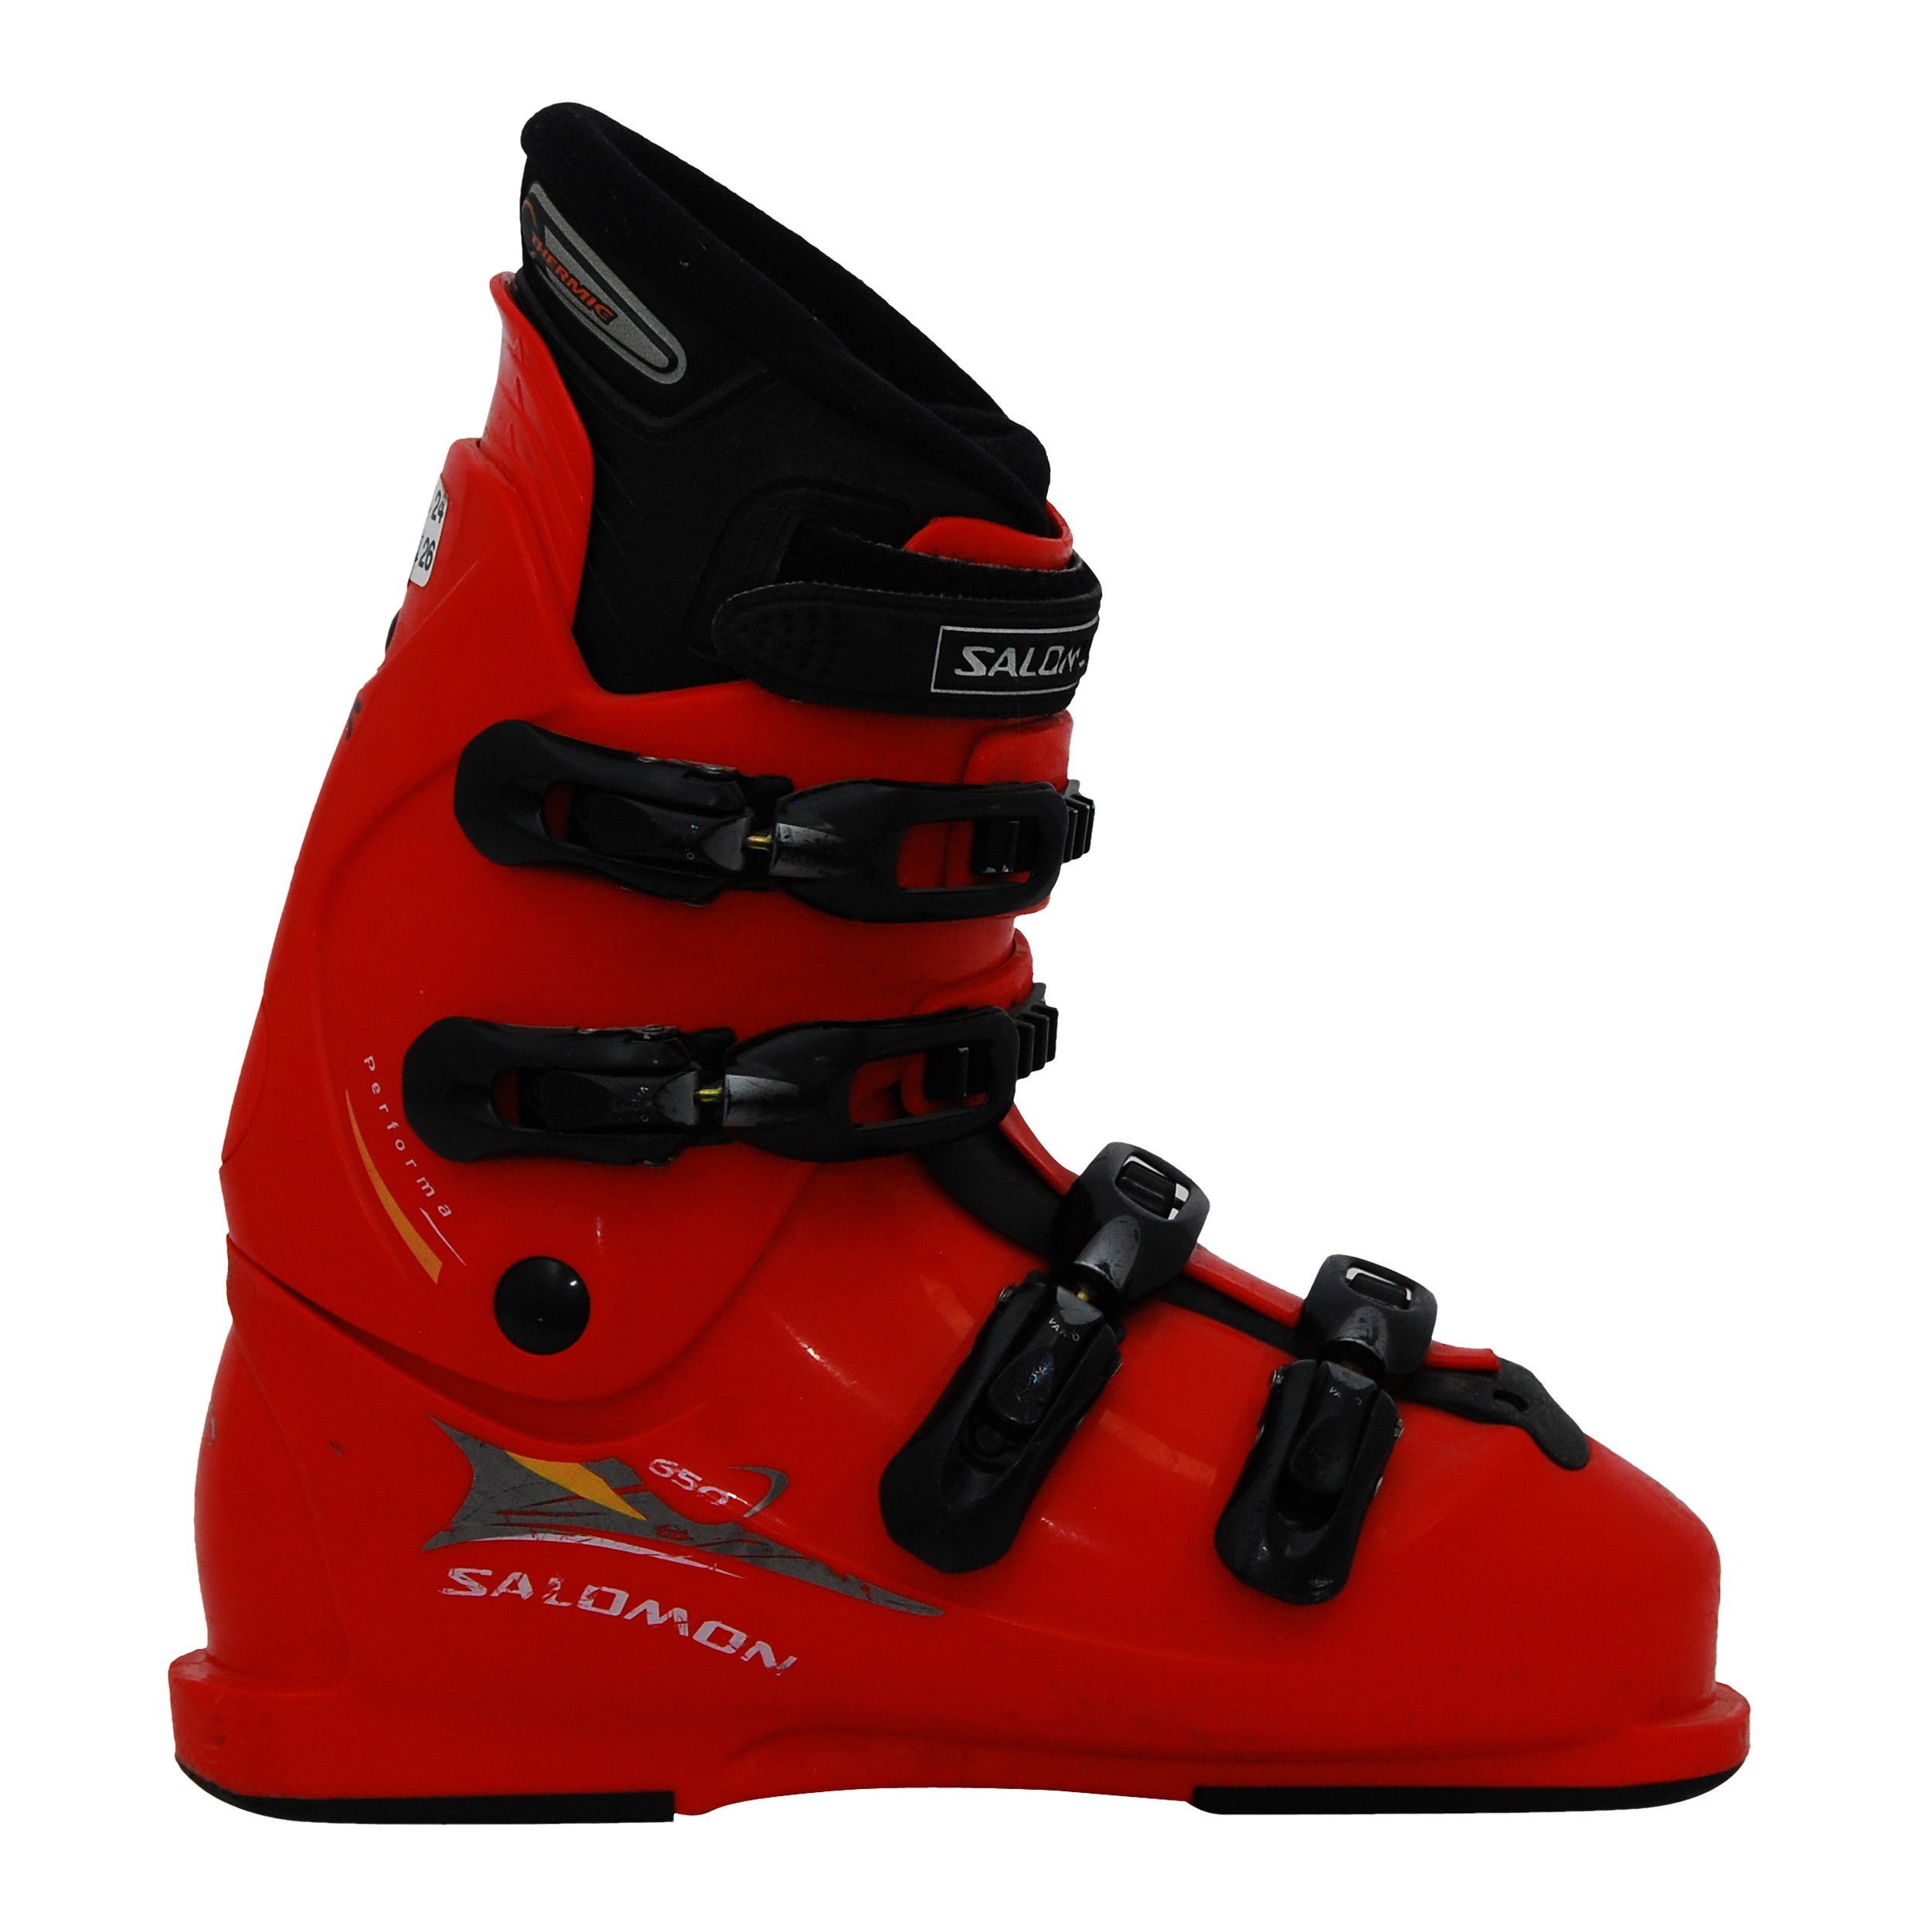 Chaussure de ski occasion Salomon performa 650 rouge